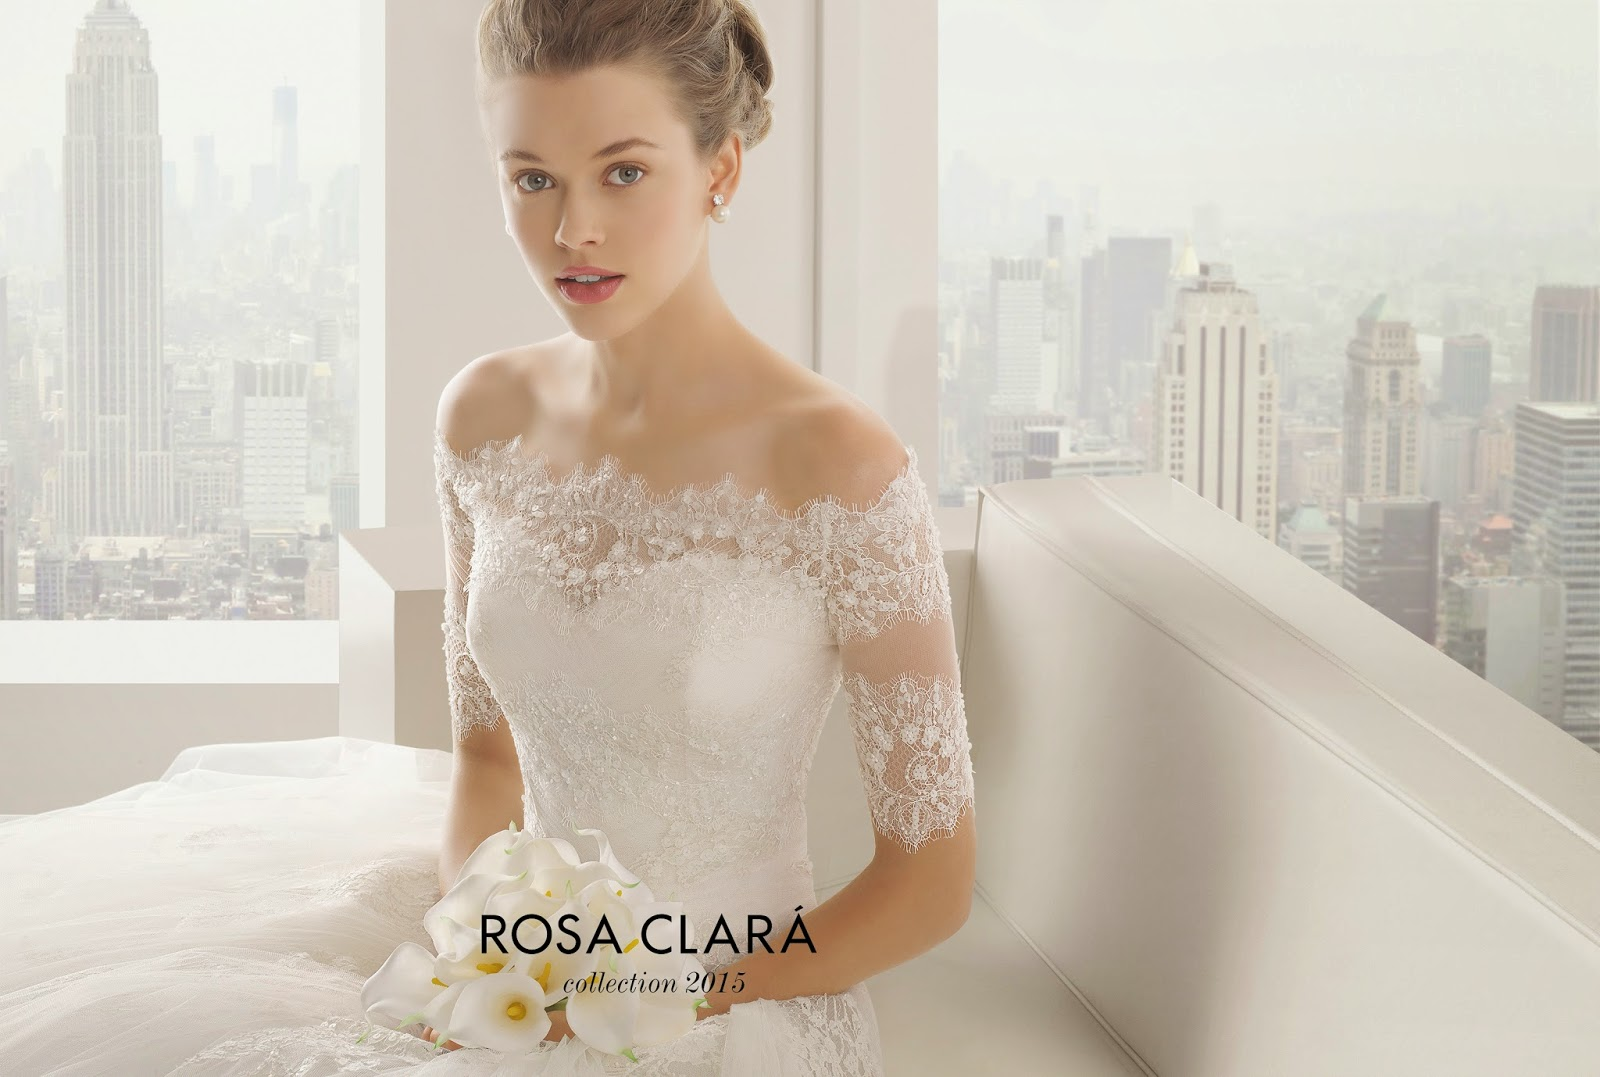 8b76b2bcf32e Tendenze abiti da sposa 2015 - Moda nozze - Forum Matrimonio.com